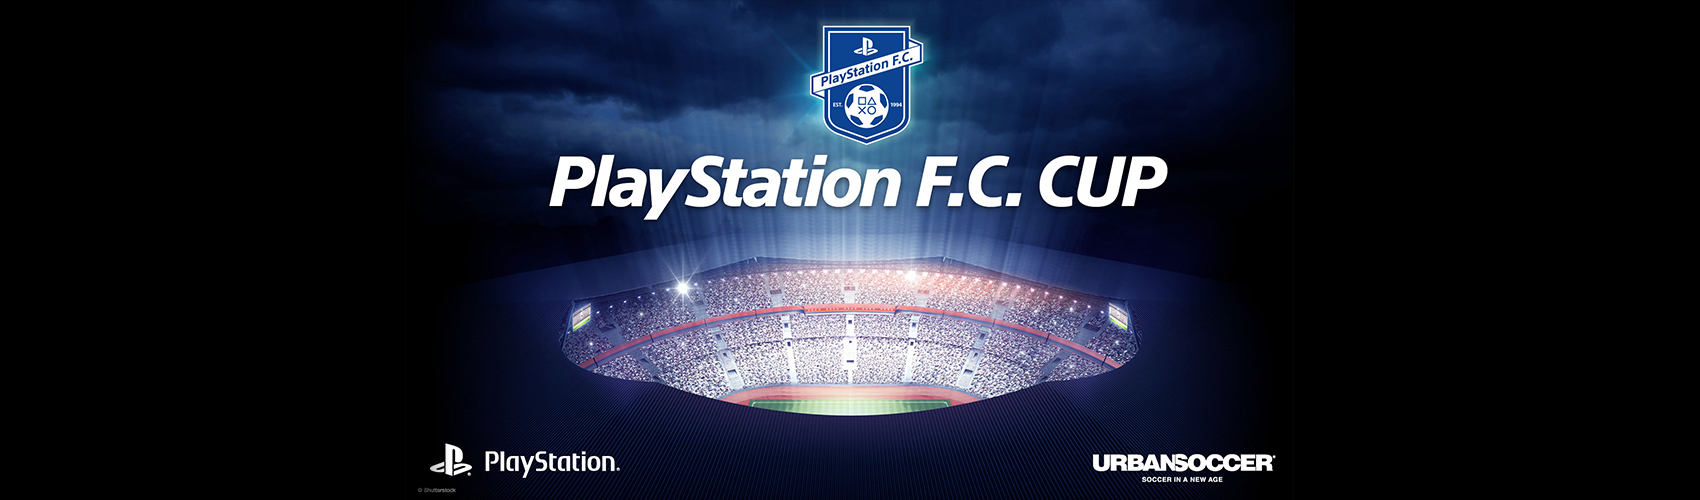 Slider-Playstation-FC-CUP-2019